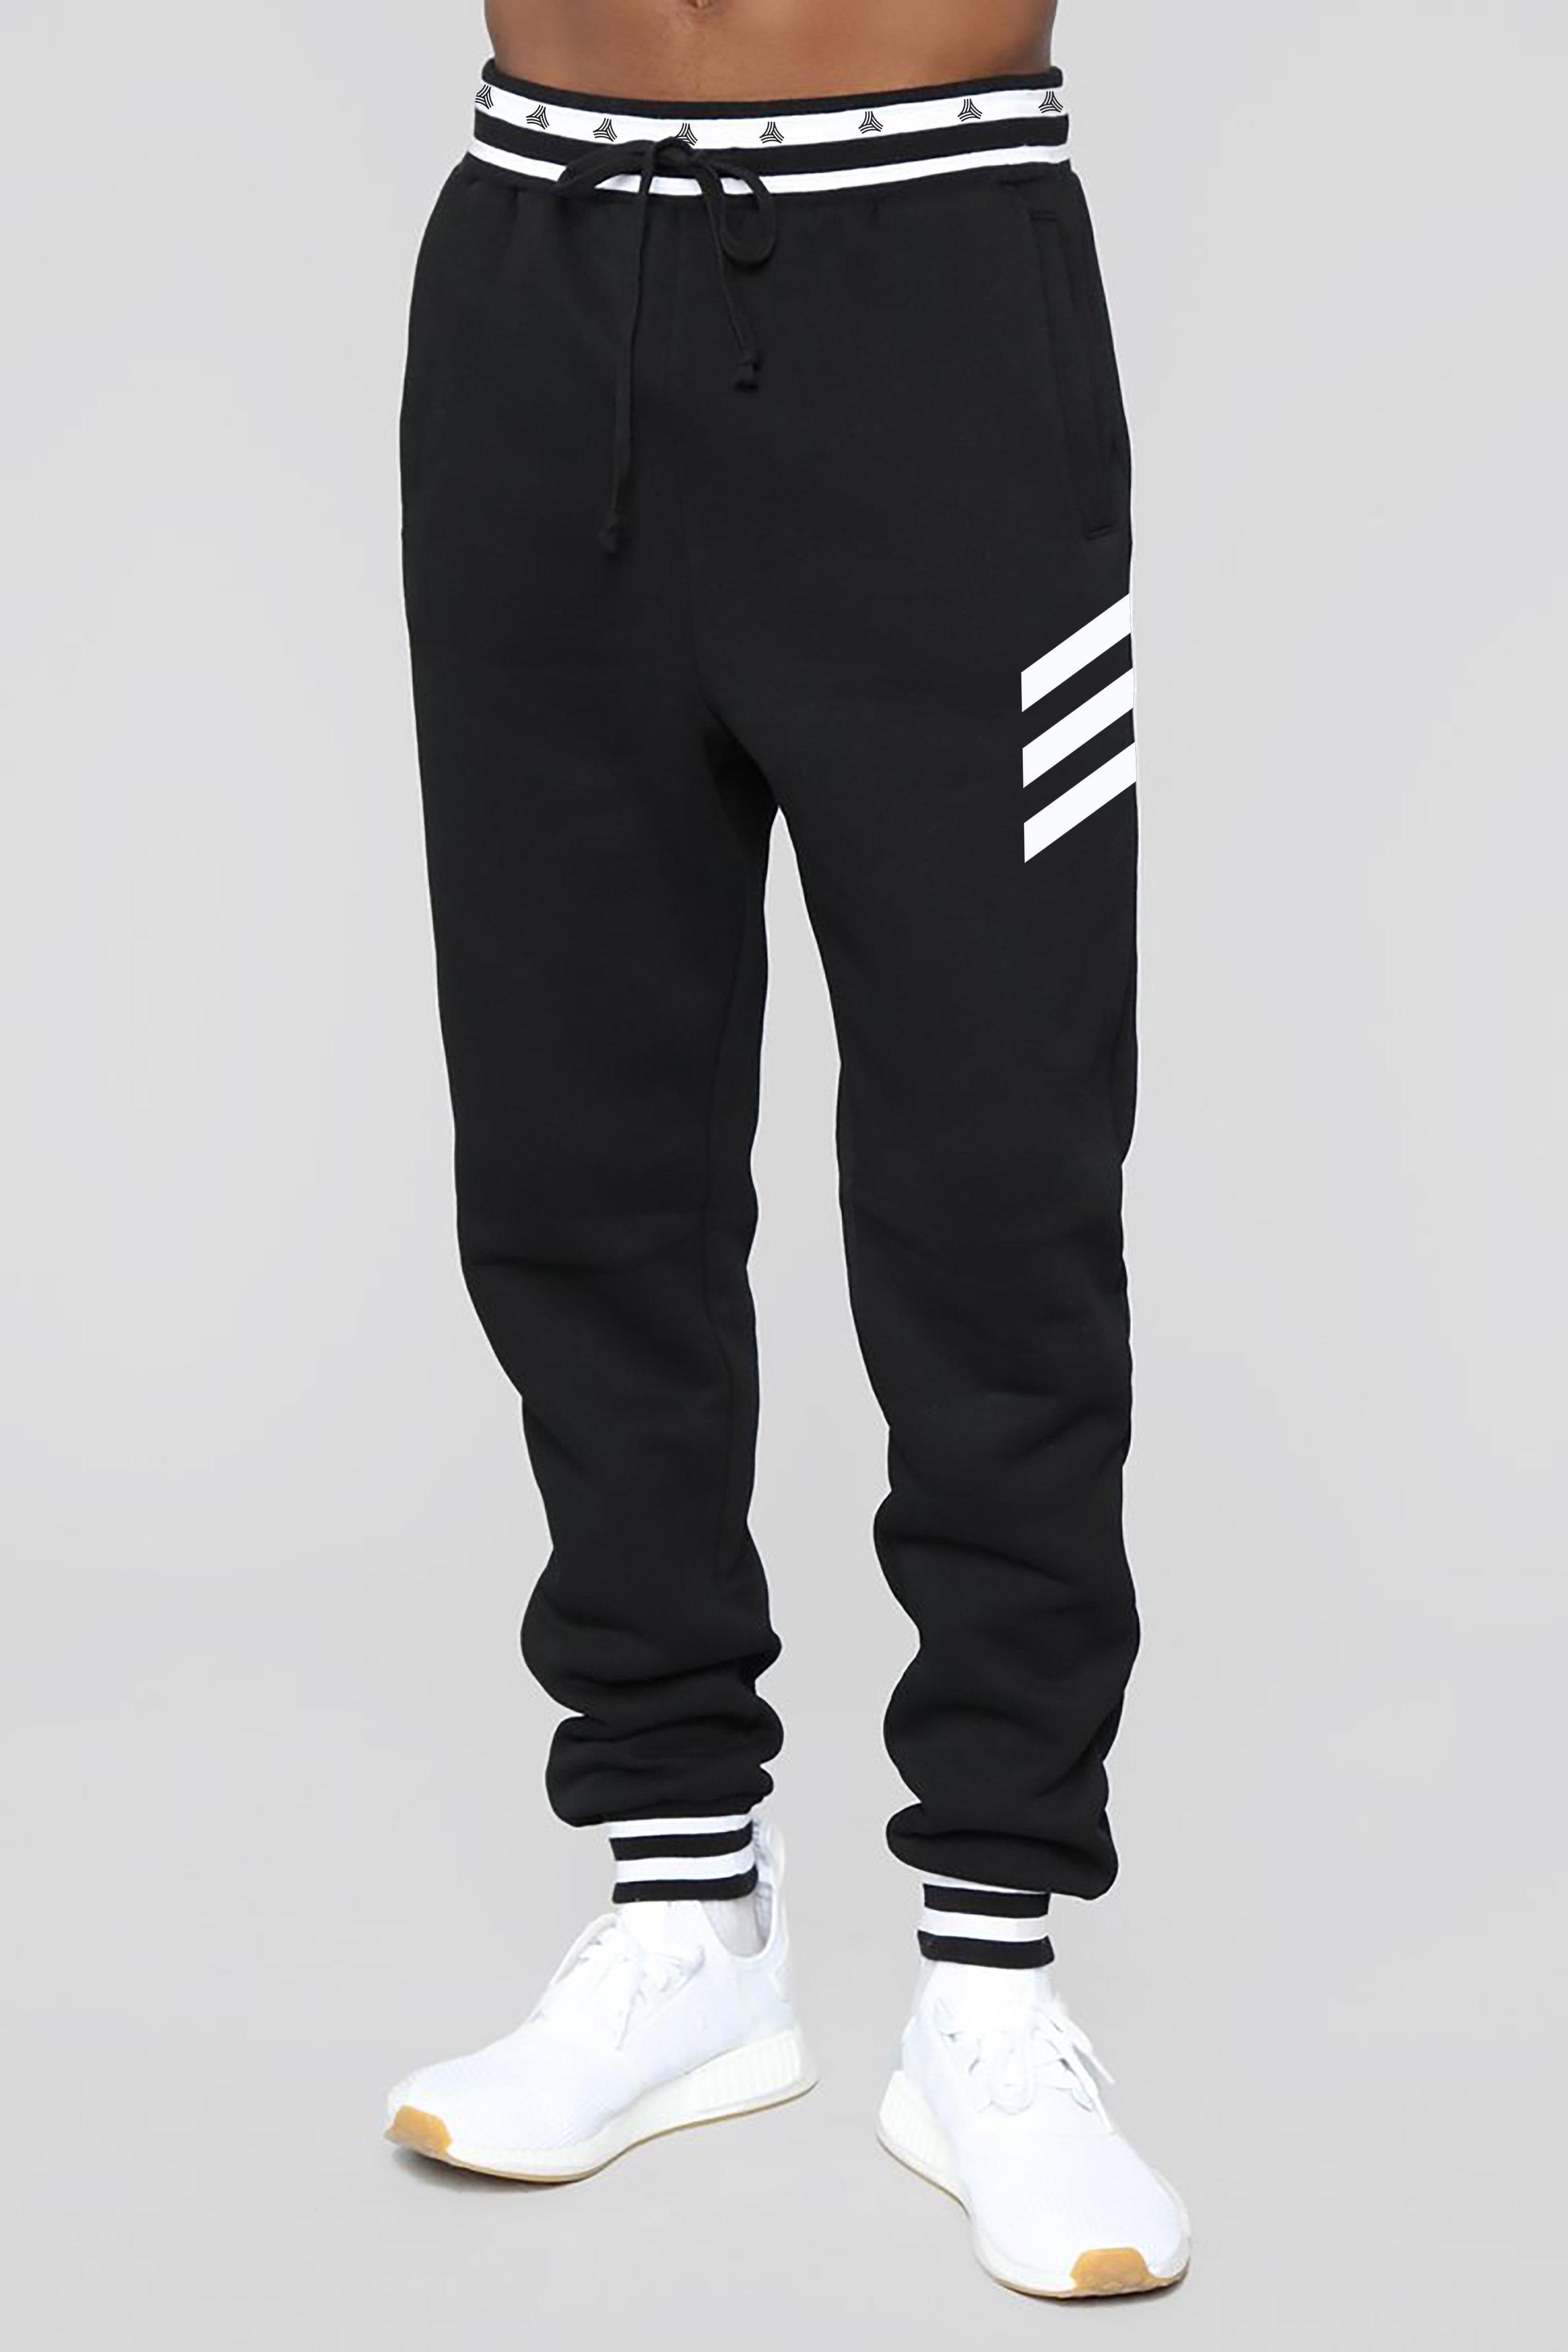 Adidas Tango_Pant Design_2019_Option1.jpg